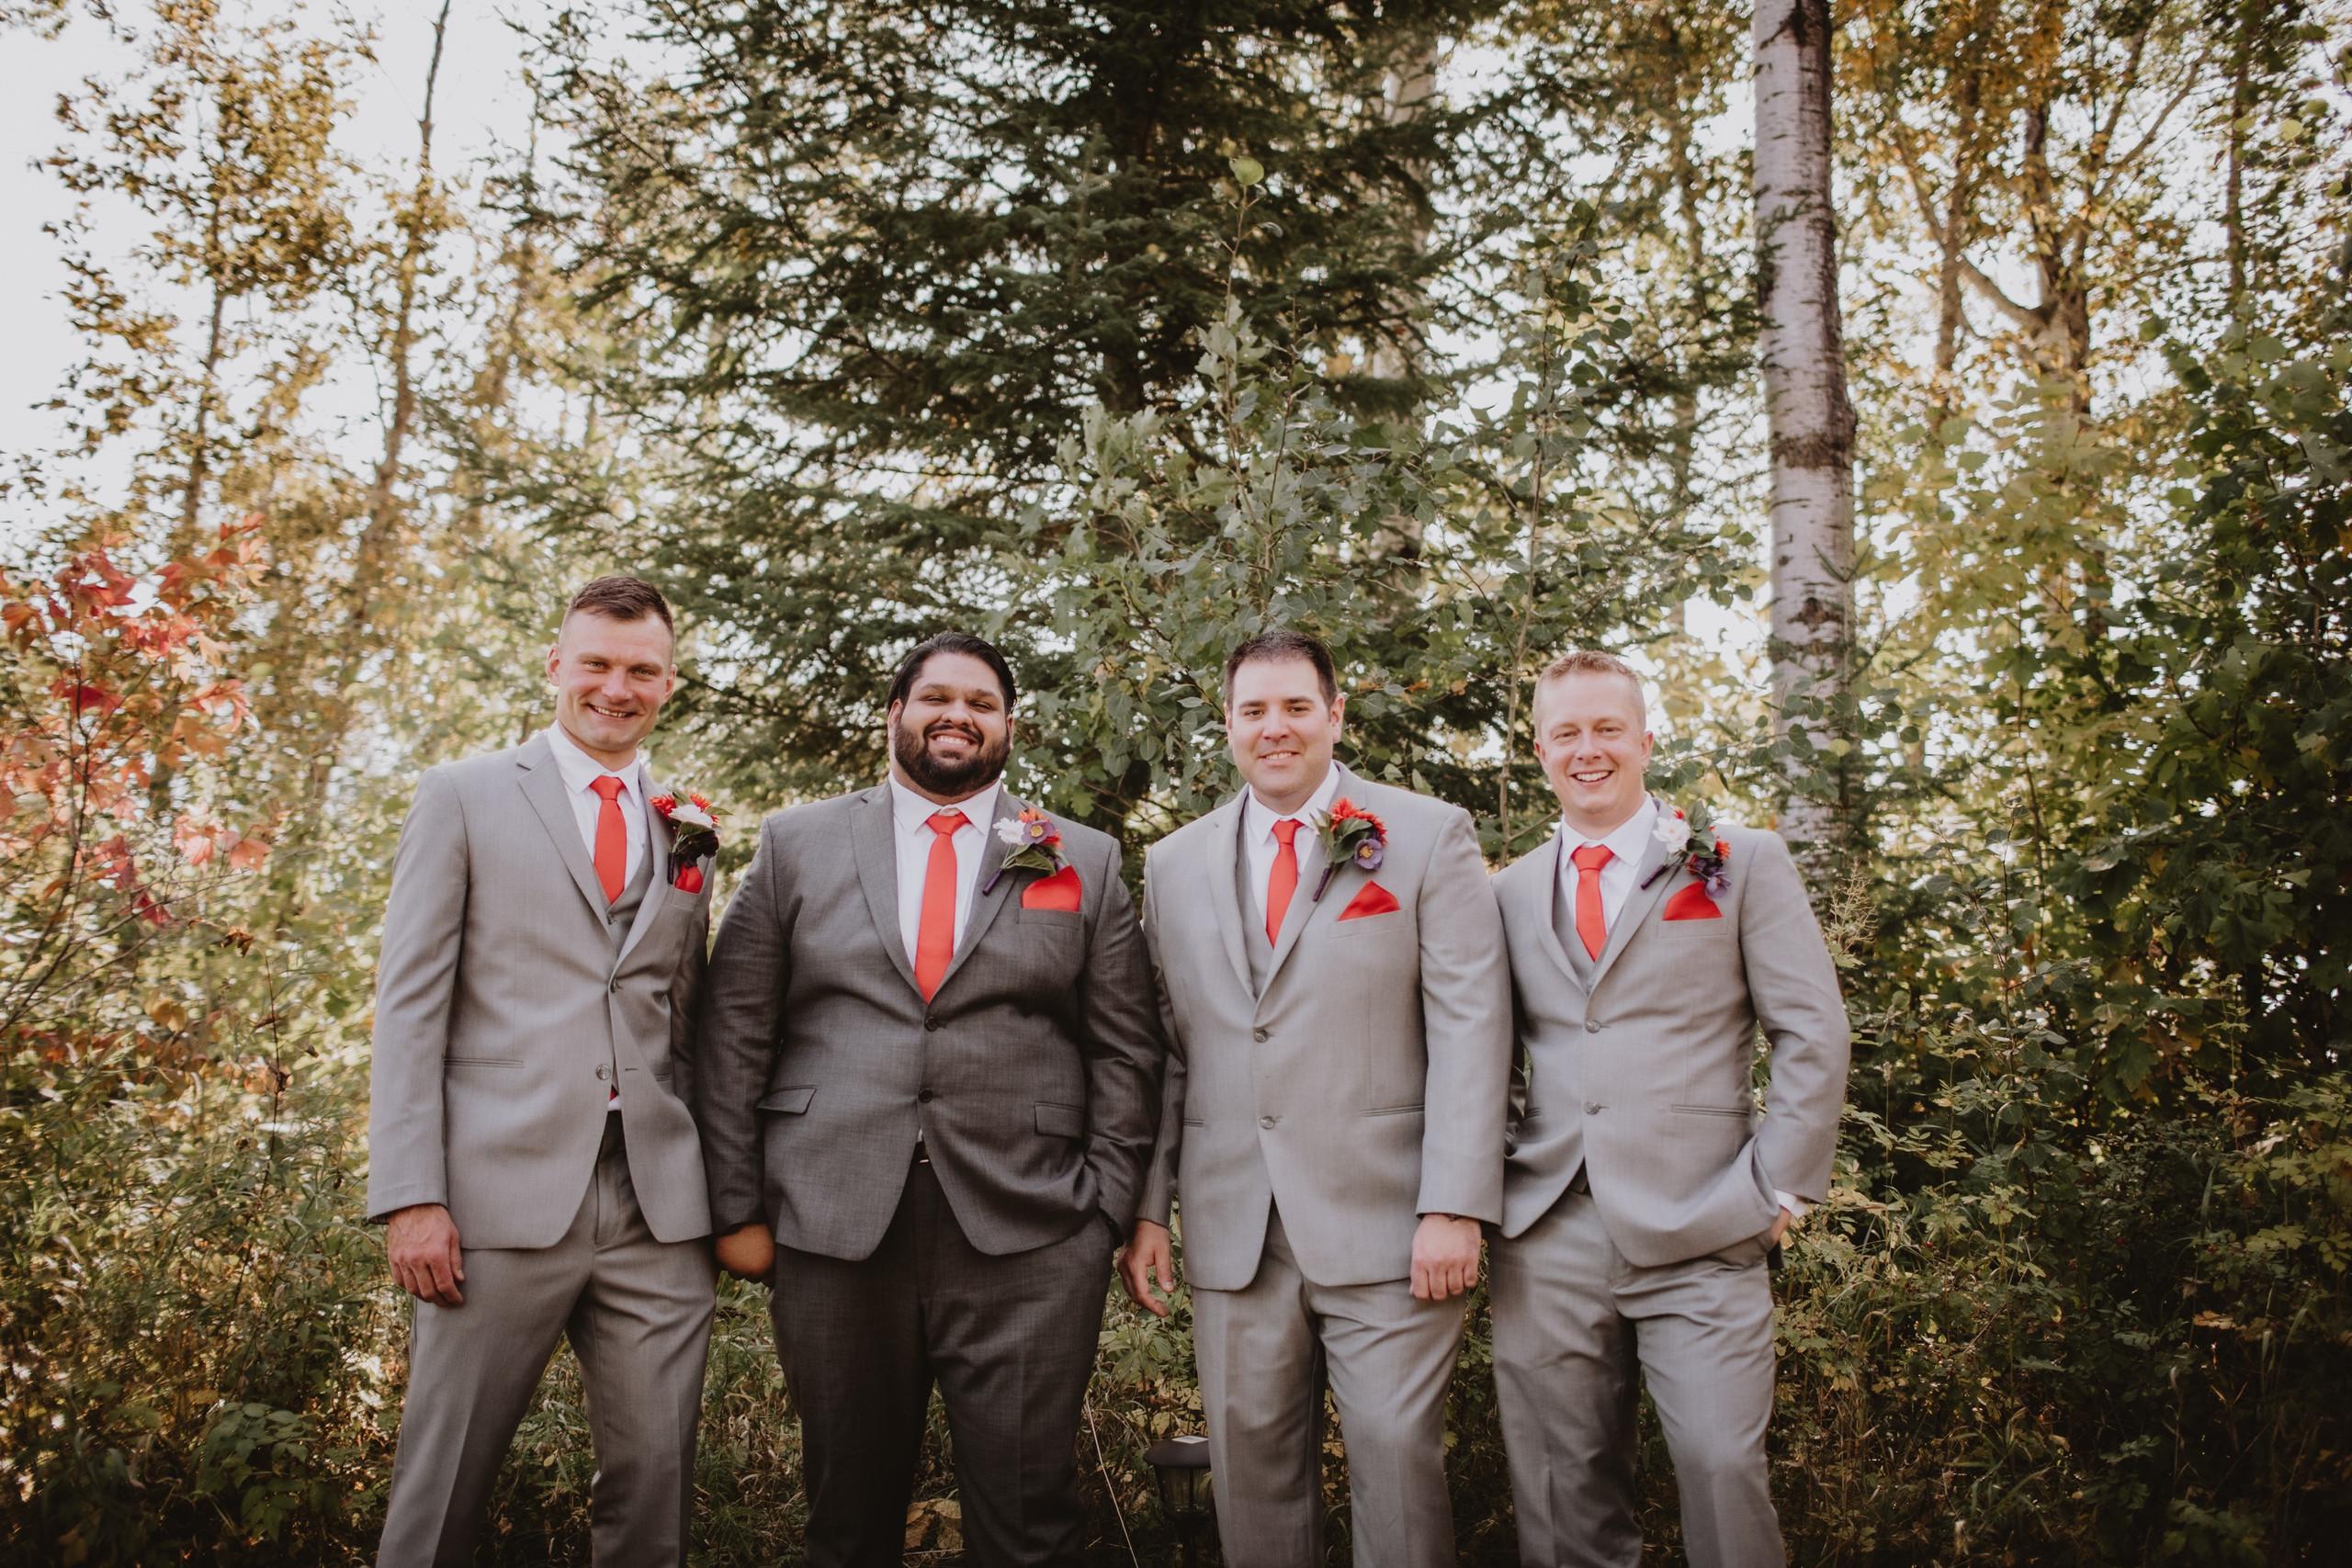 Groomsmen Portrait during fall wedding day.